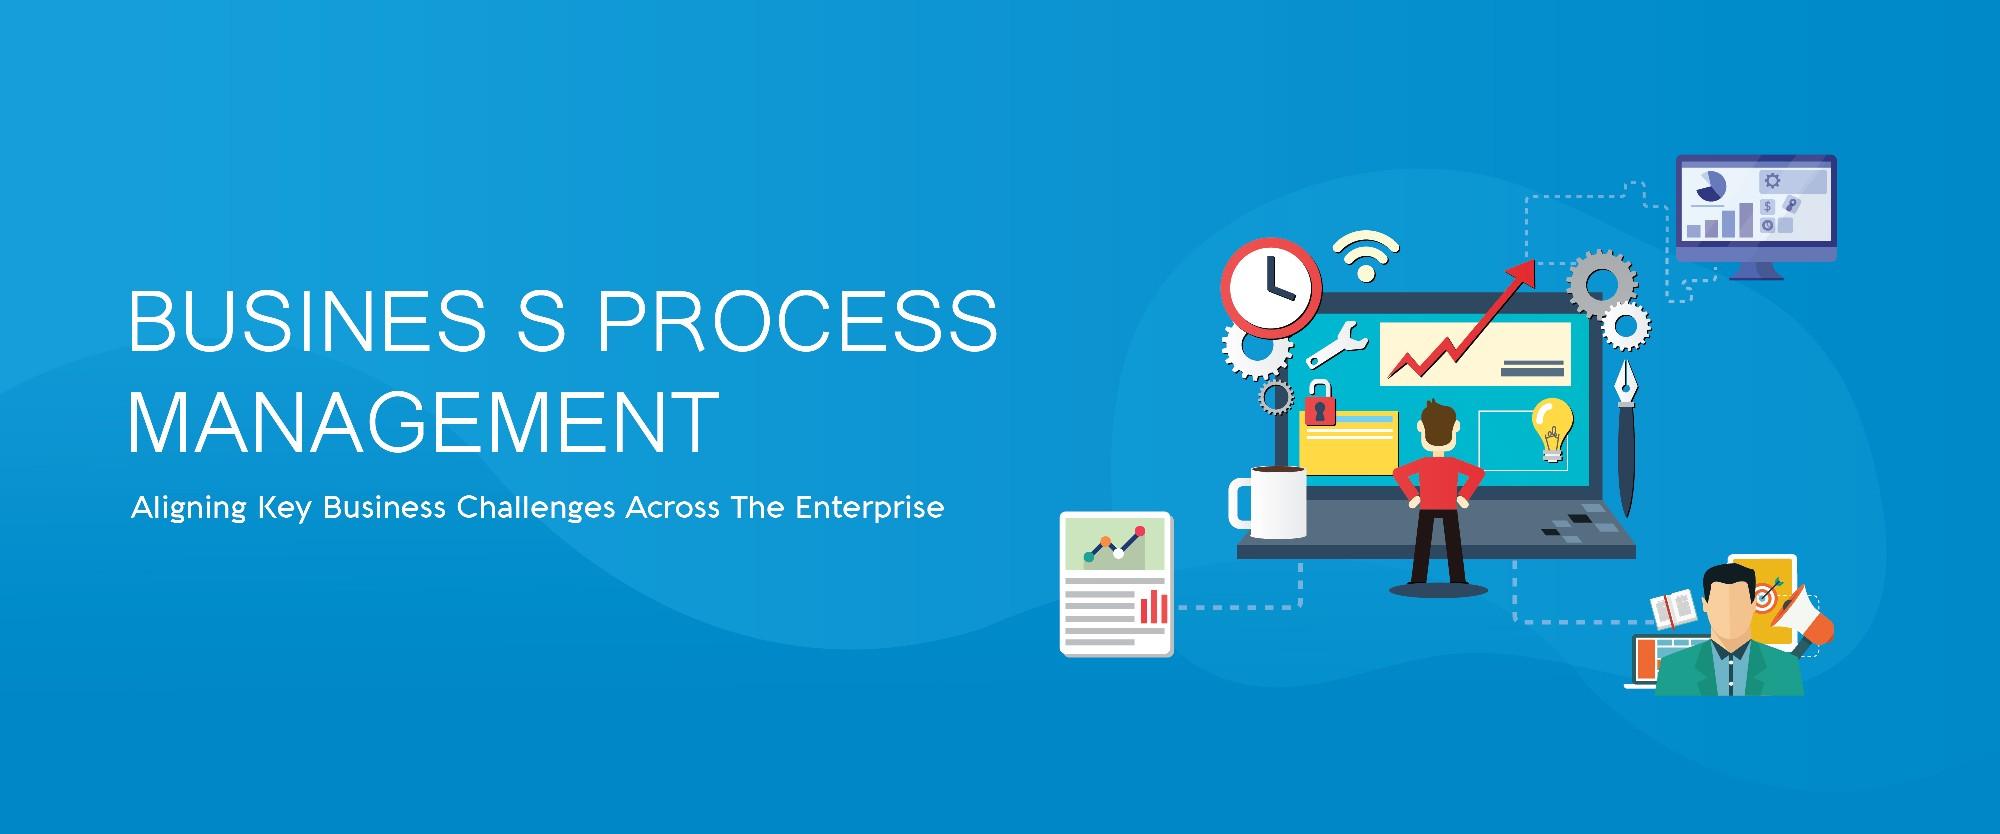 5.Business Process Management-01